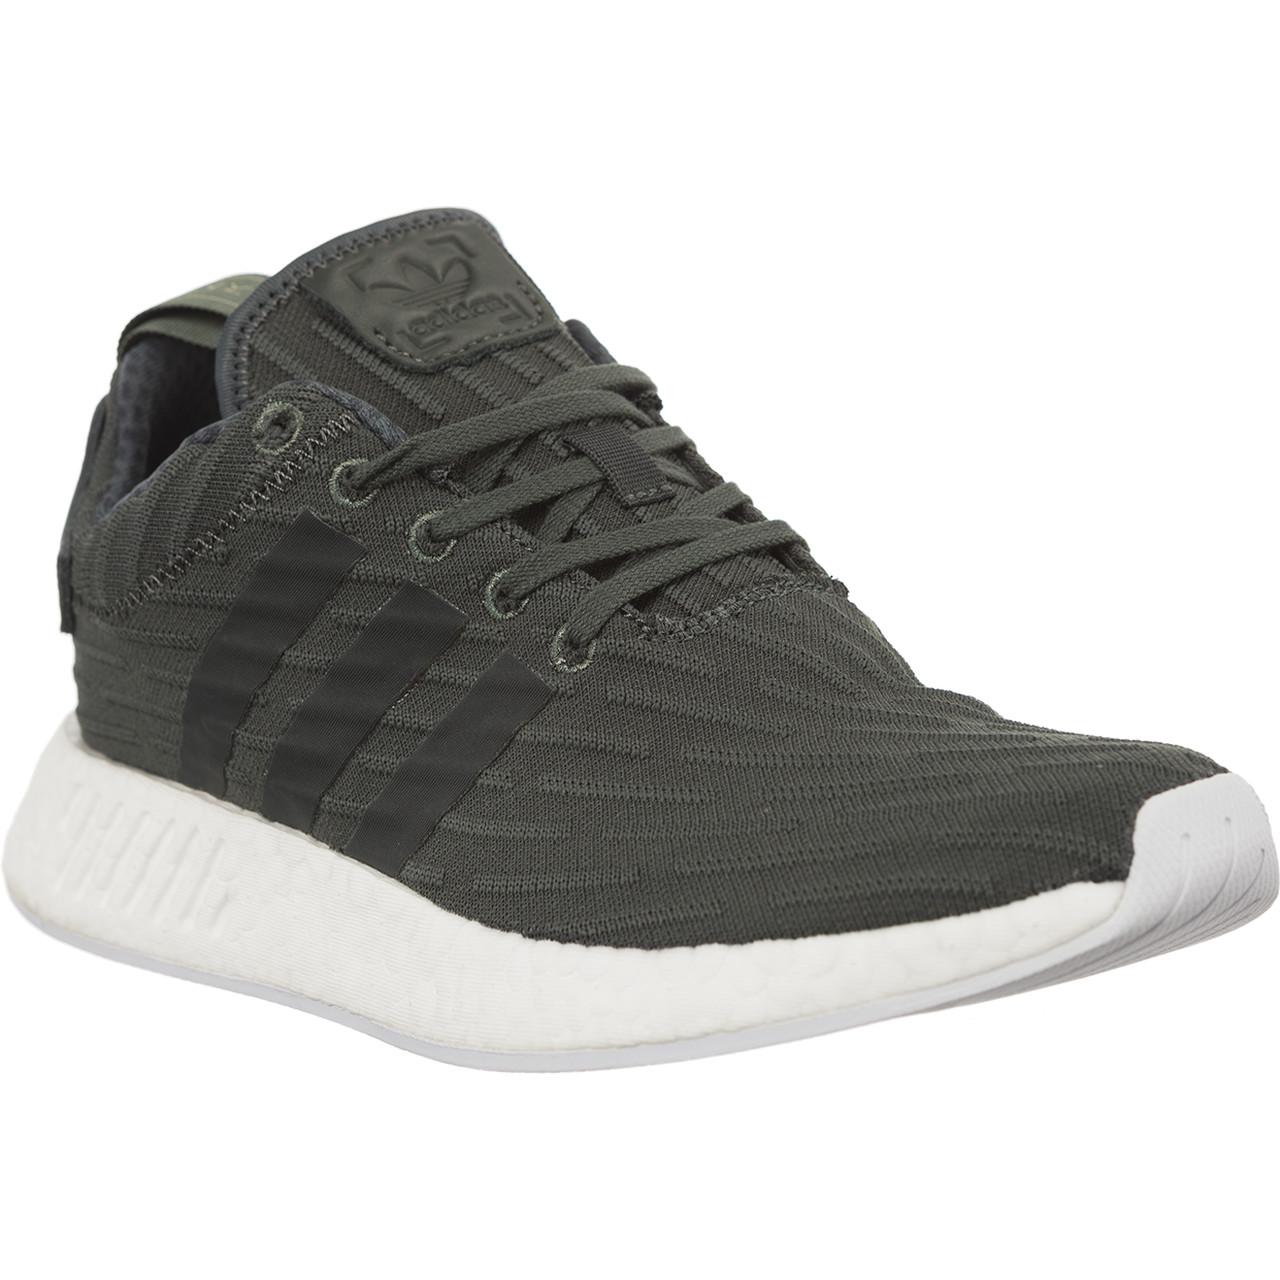 newest d1ce9 f15a0 ... 43e6d11ea9a0 Buty adidas NMD R2 W 261 - eastend.pl!